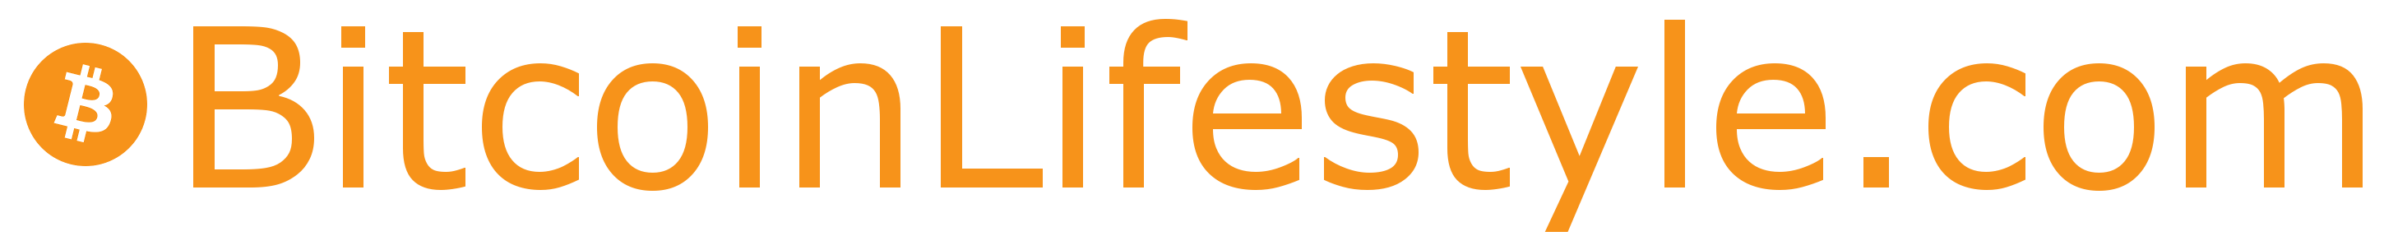 BitcoinLifestyle.com